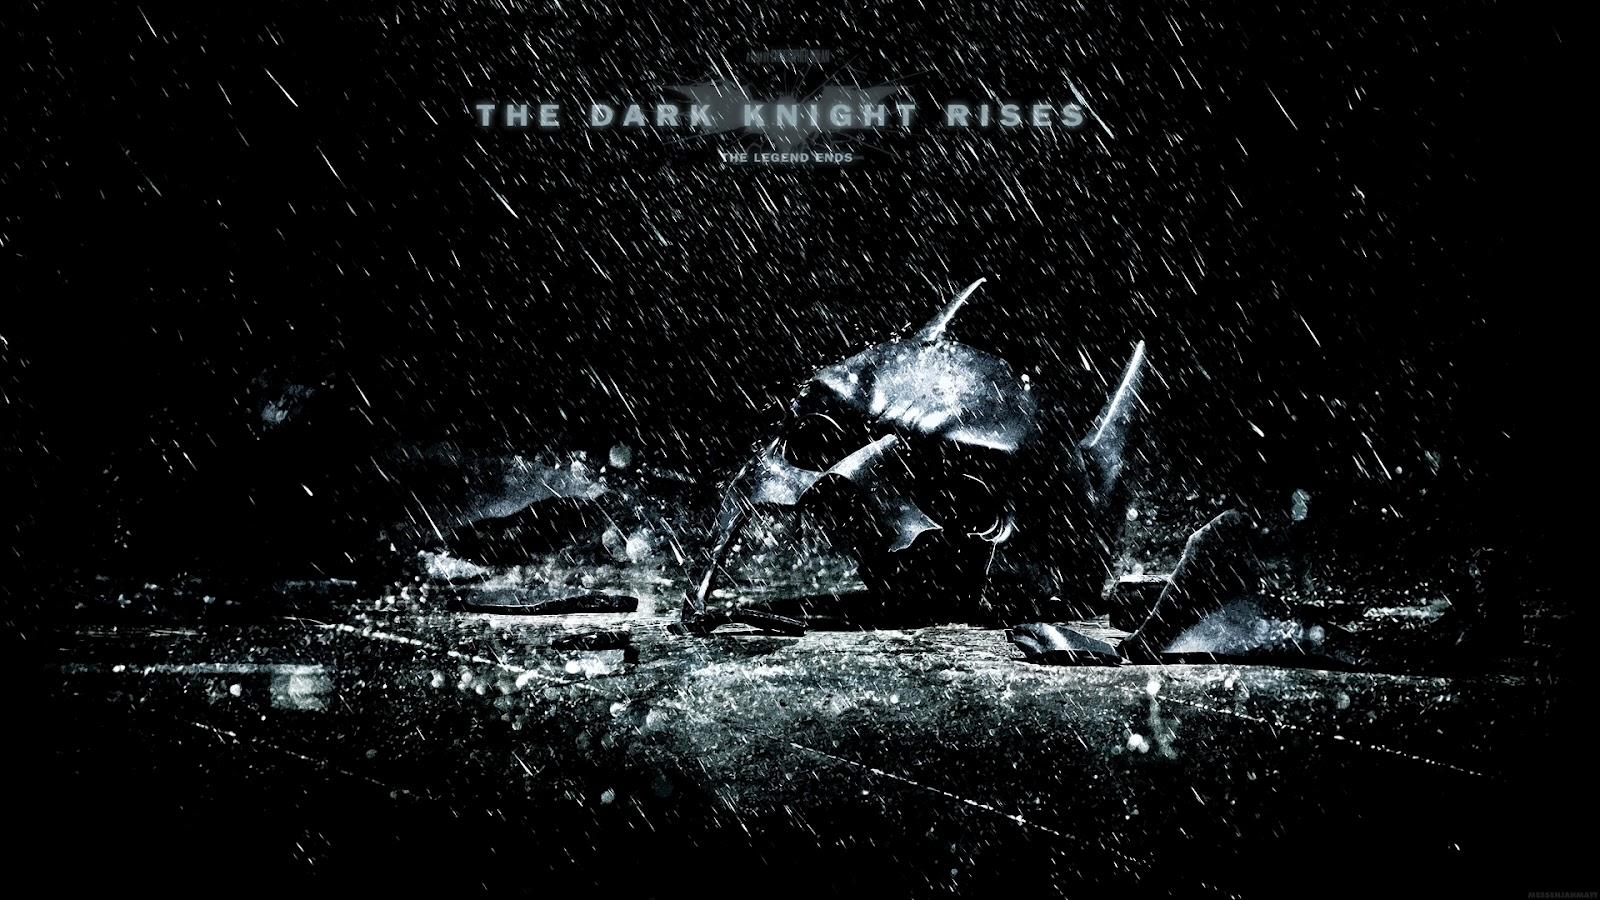 Rendered Bits The Dark Knight Rises Movie Wallpaper 1600x900